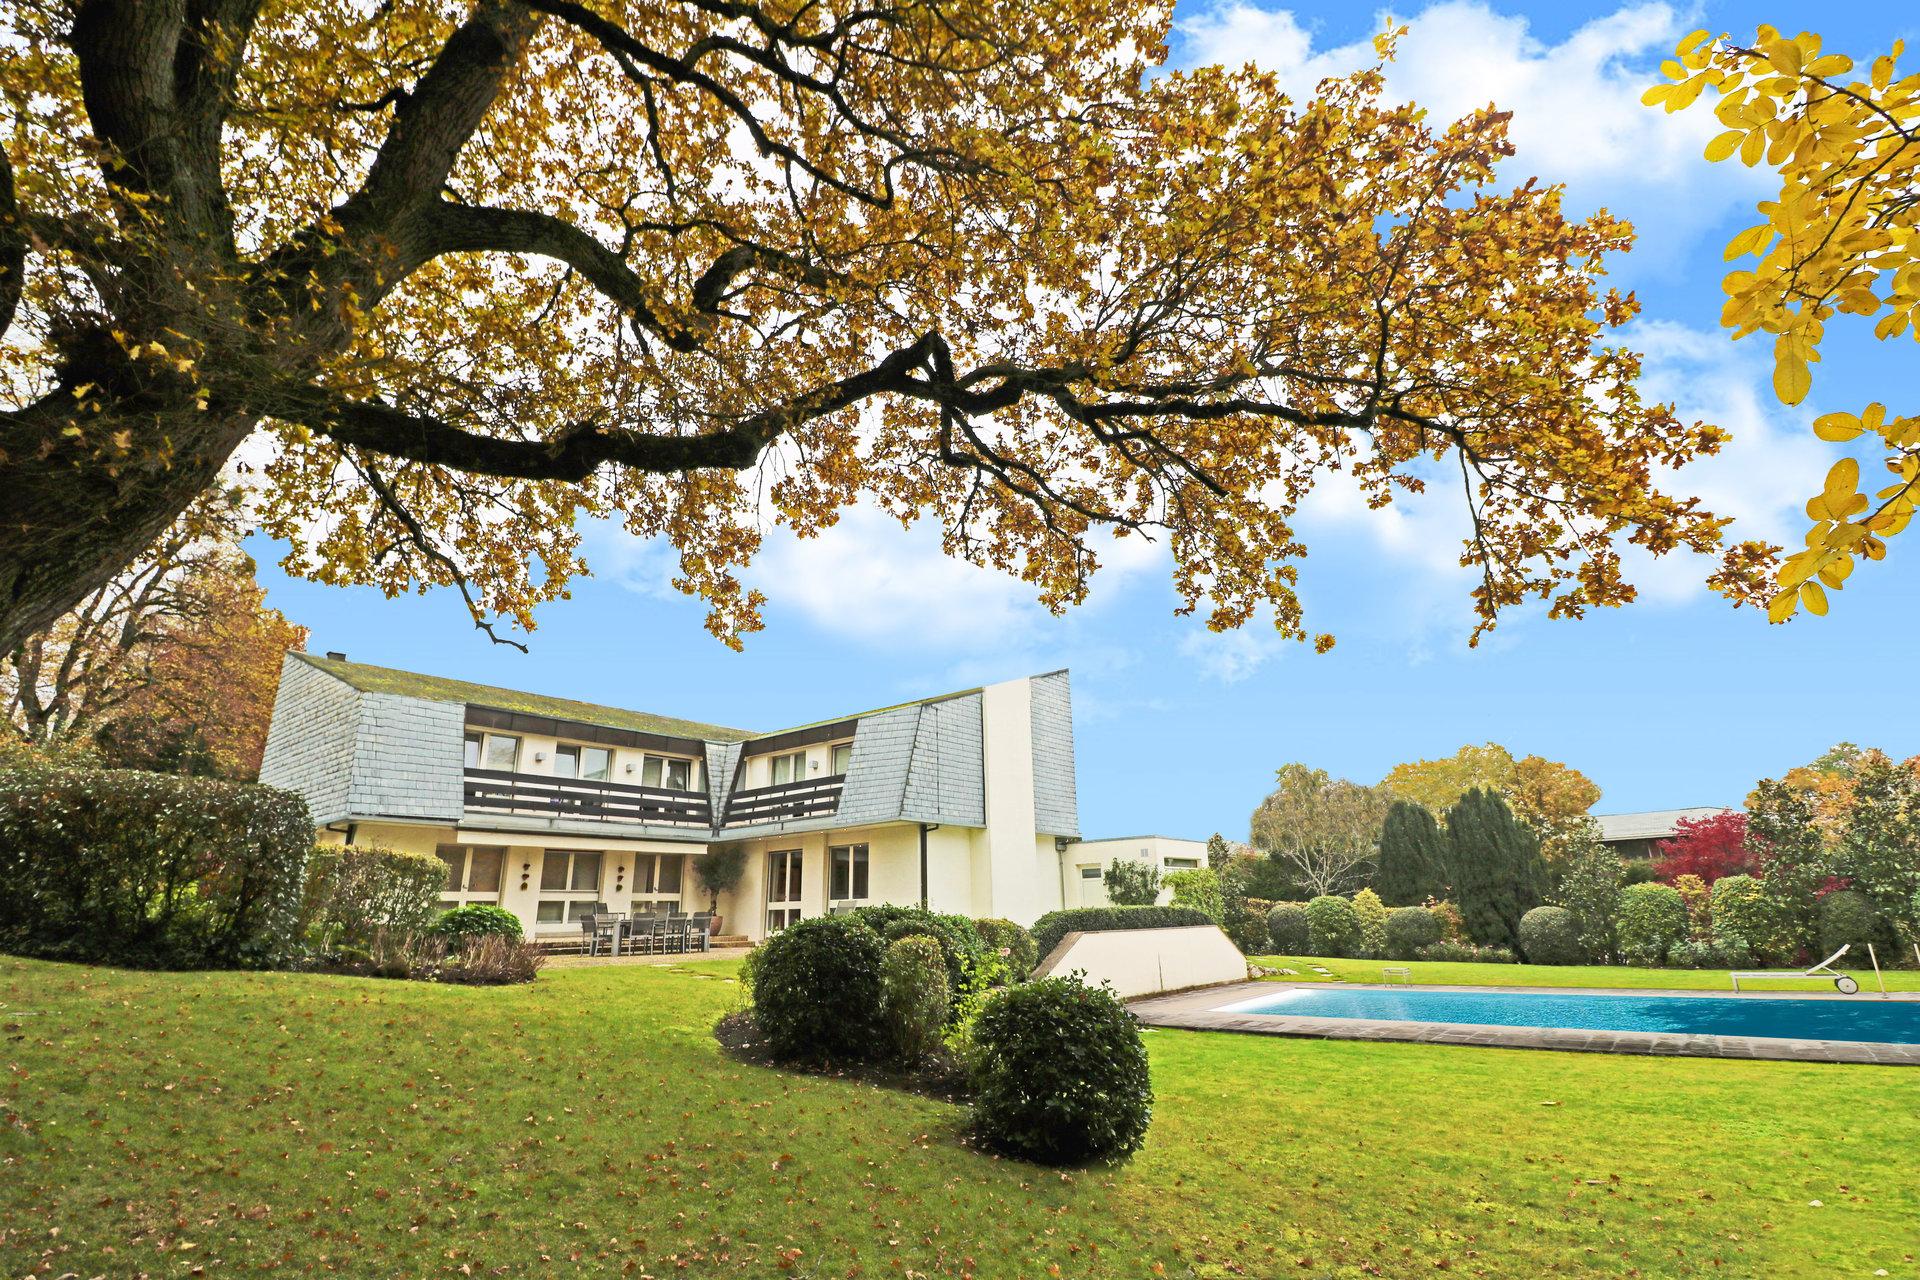 Villa 11 Pièces 4 Chambres 400 M² Vandoeuvres | Bernard-Nicod dedans Piscine De La Hardt